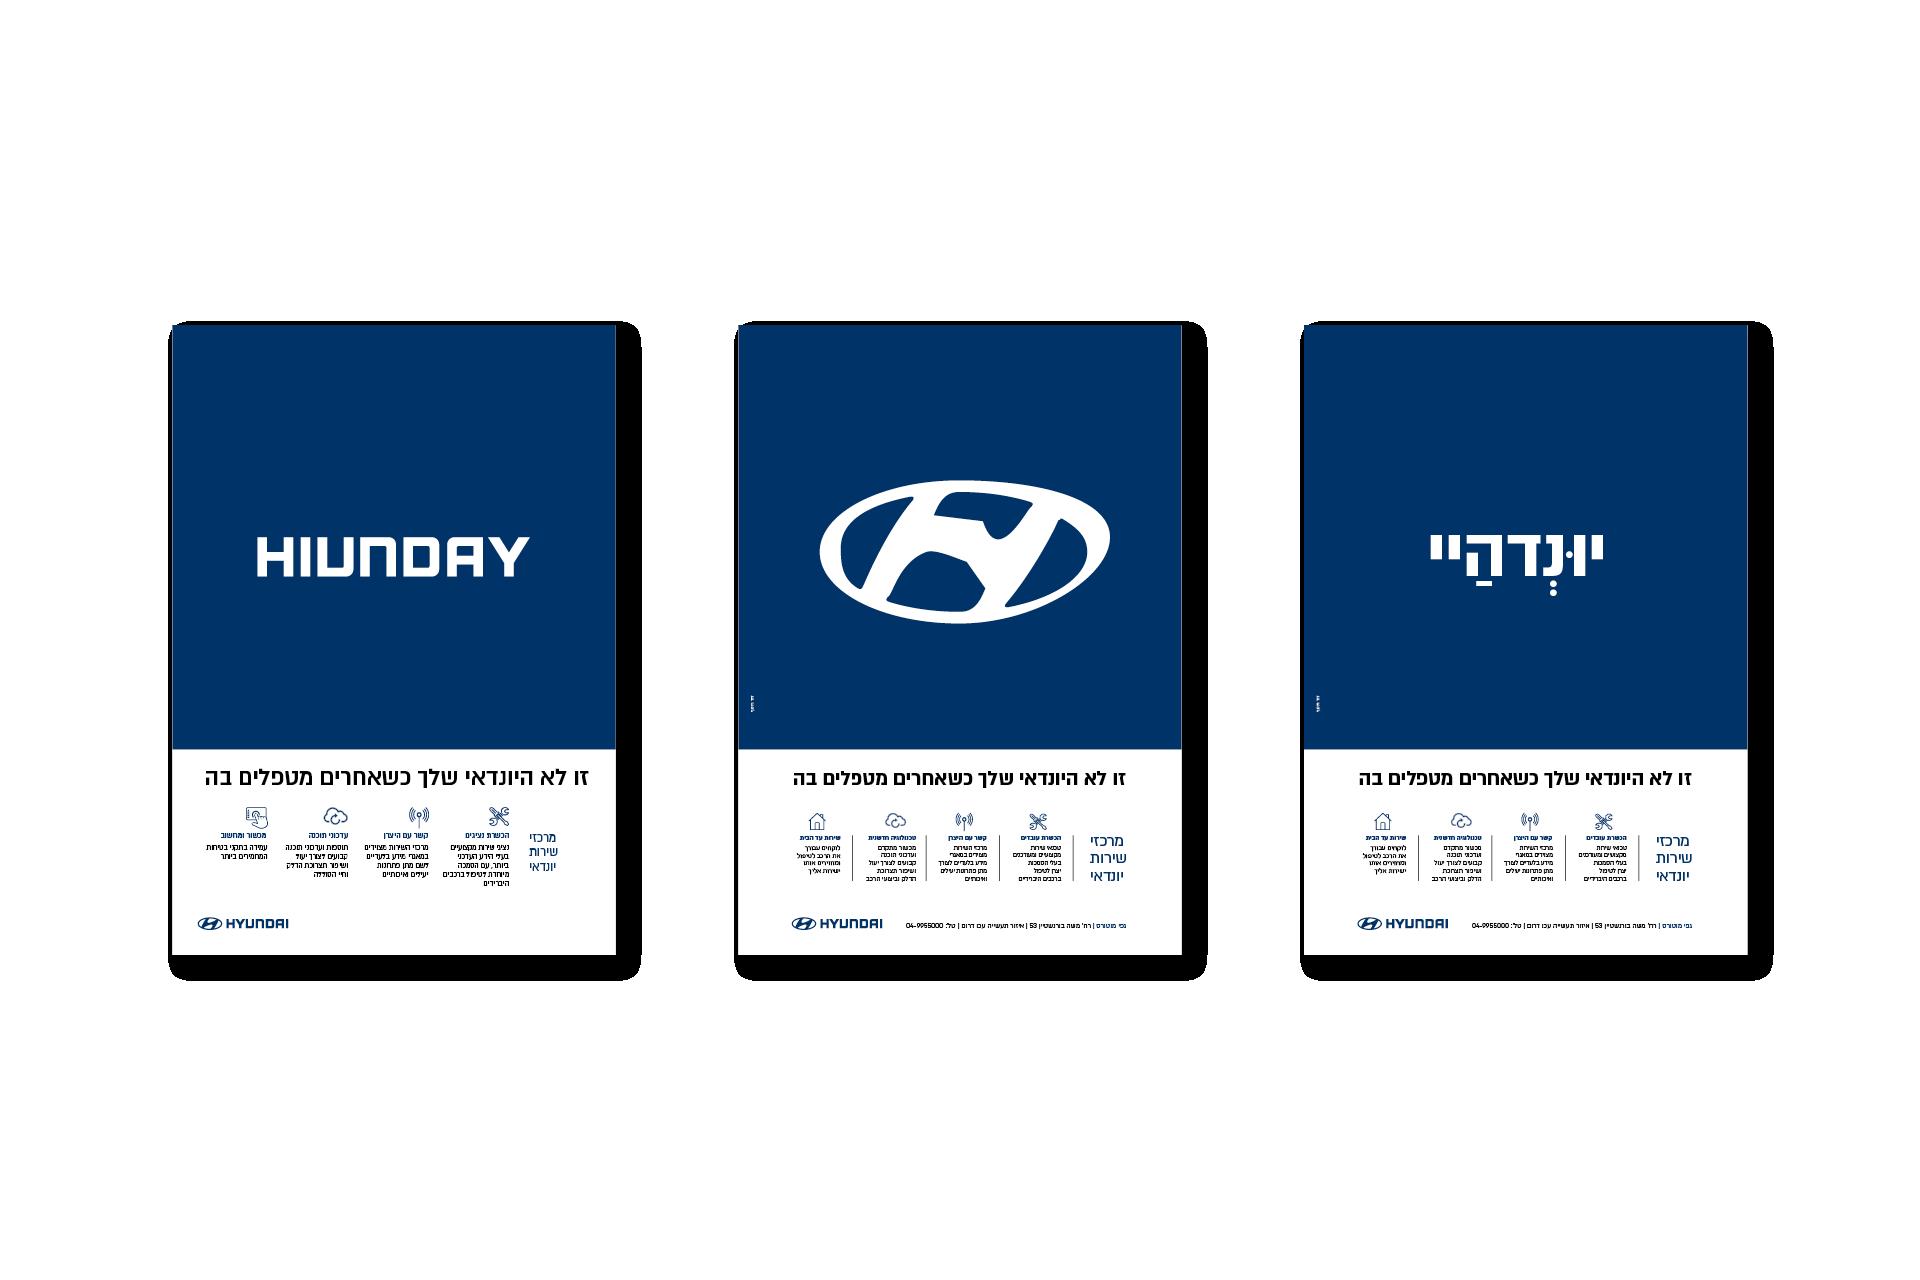 Hyundai campaign posters